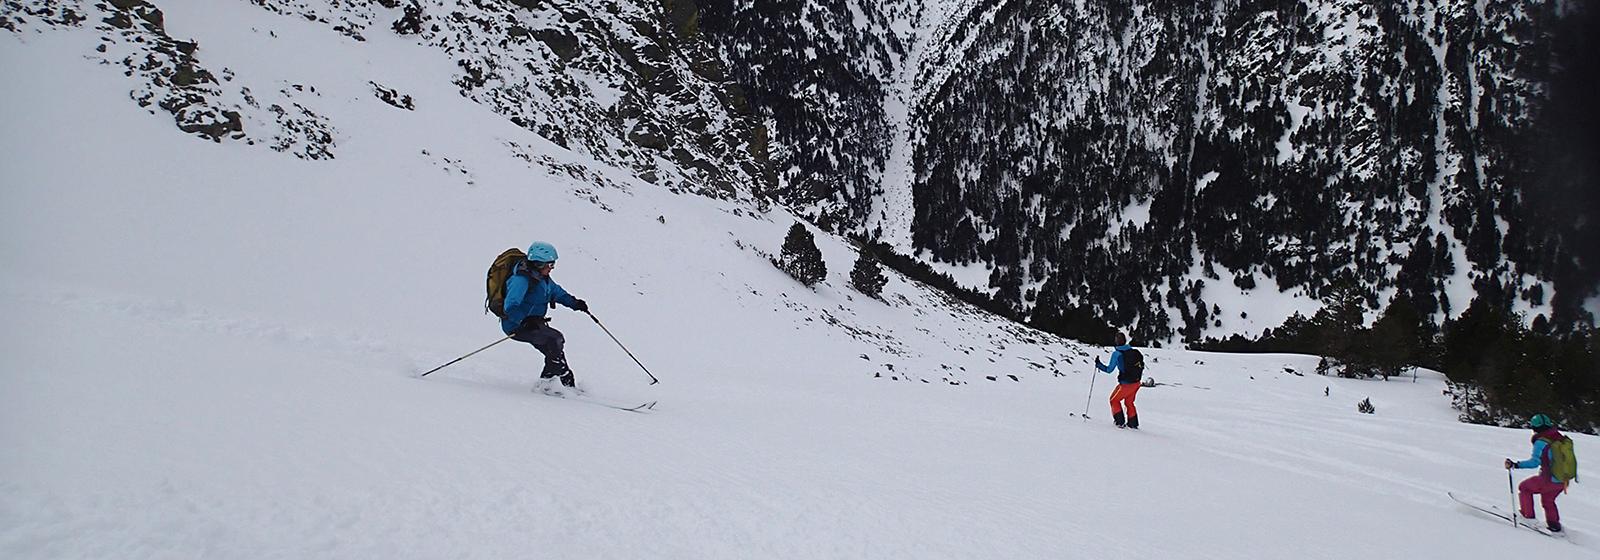 Descenso hacia la Vall de Ransol